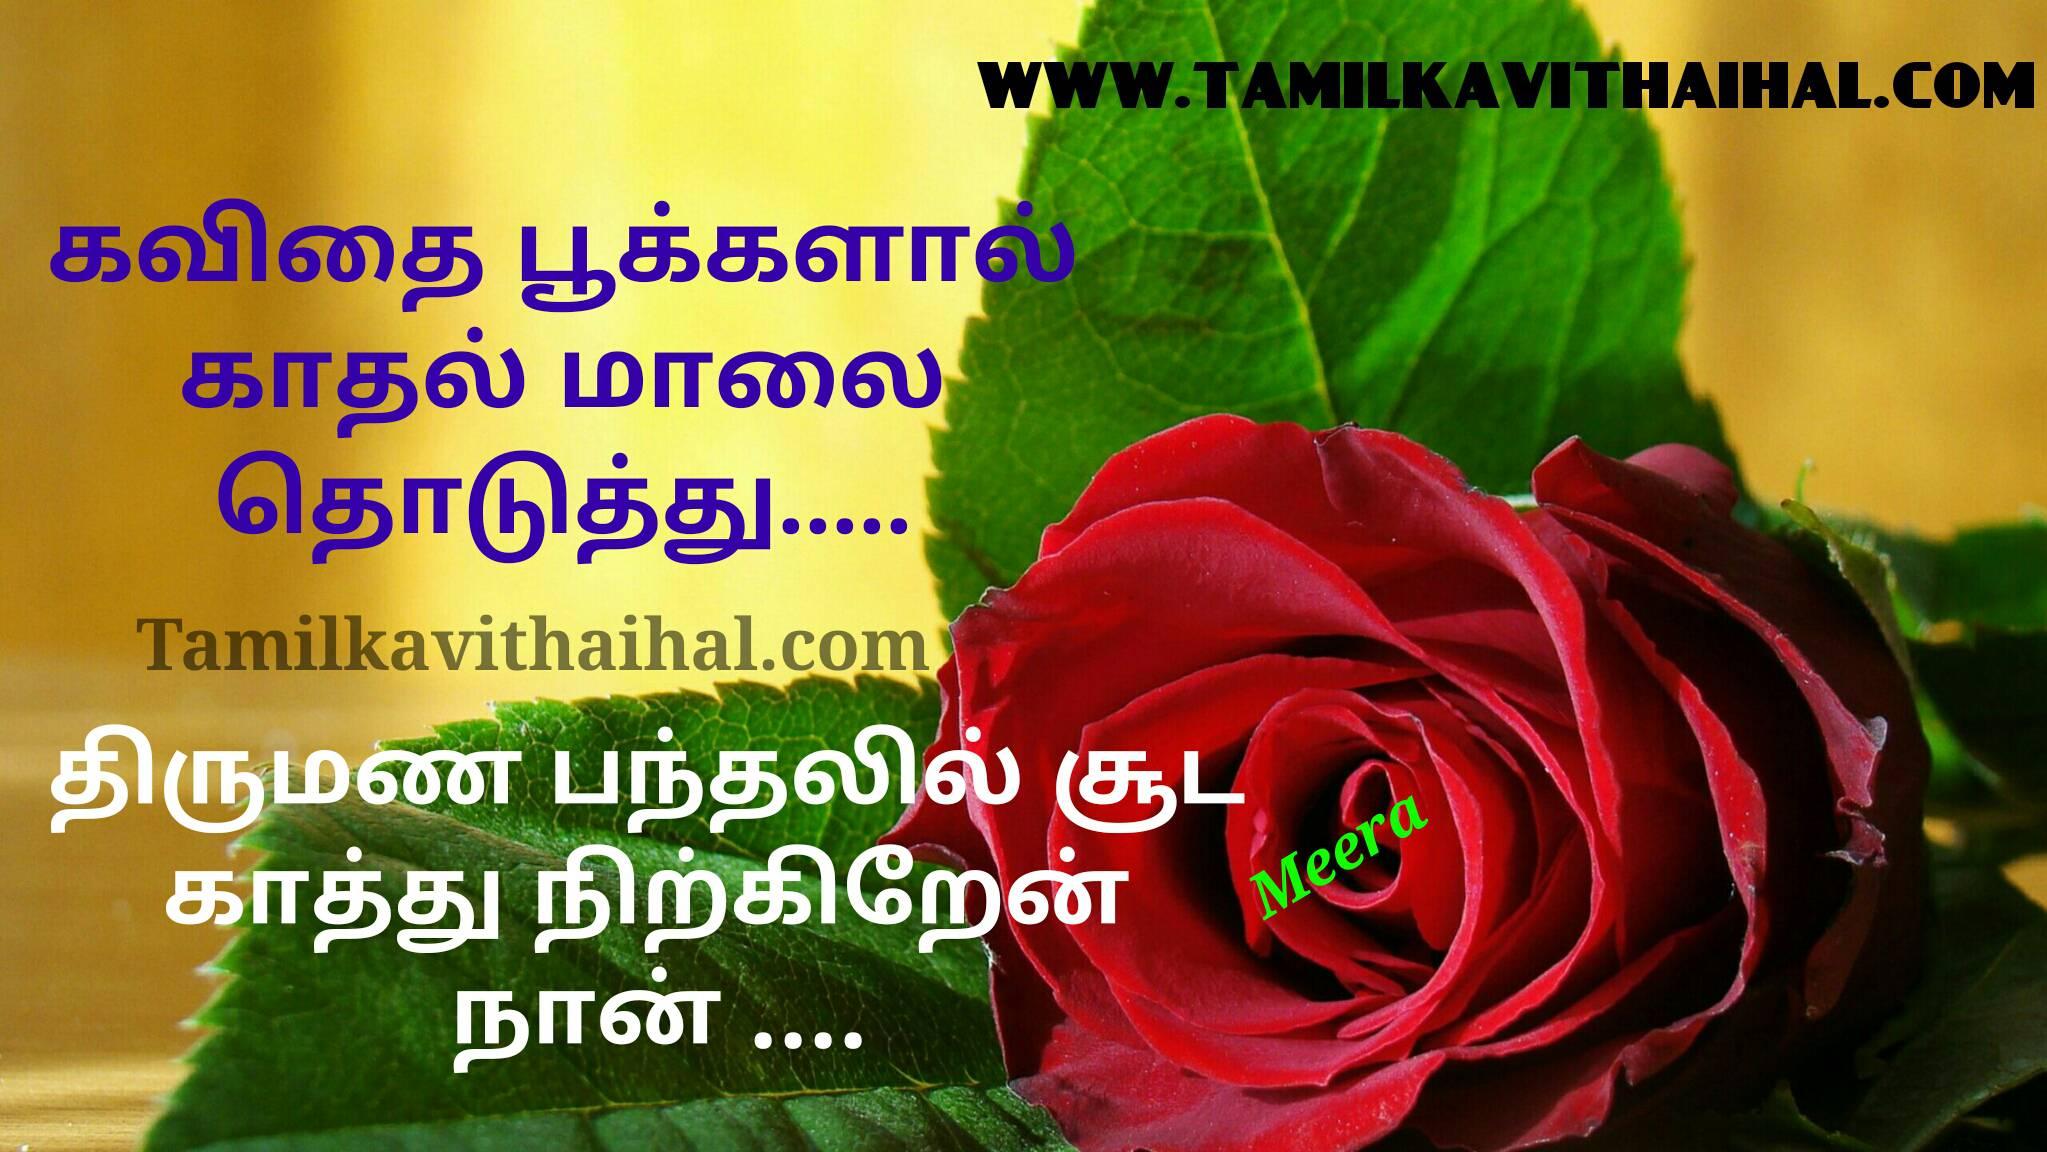 Beautiful kadhal kavithai kanavan manaivi anbu relationship cute romance feel pookal thirumanam meera poem hd image